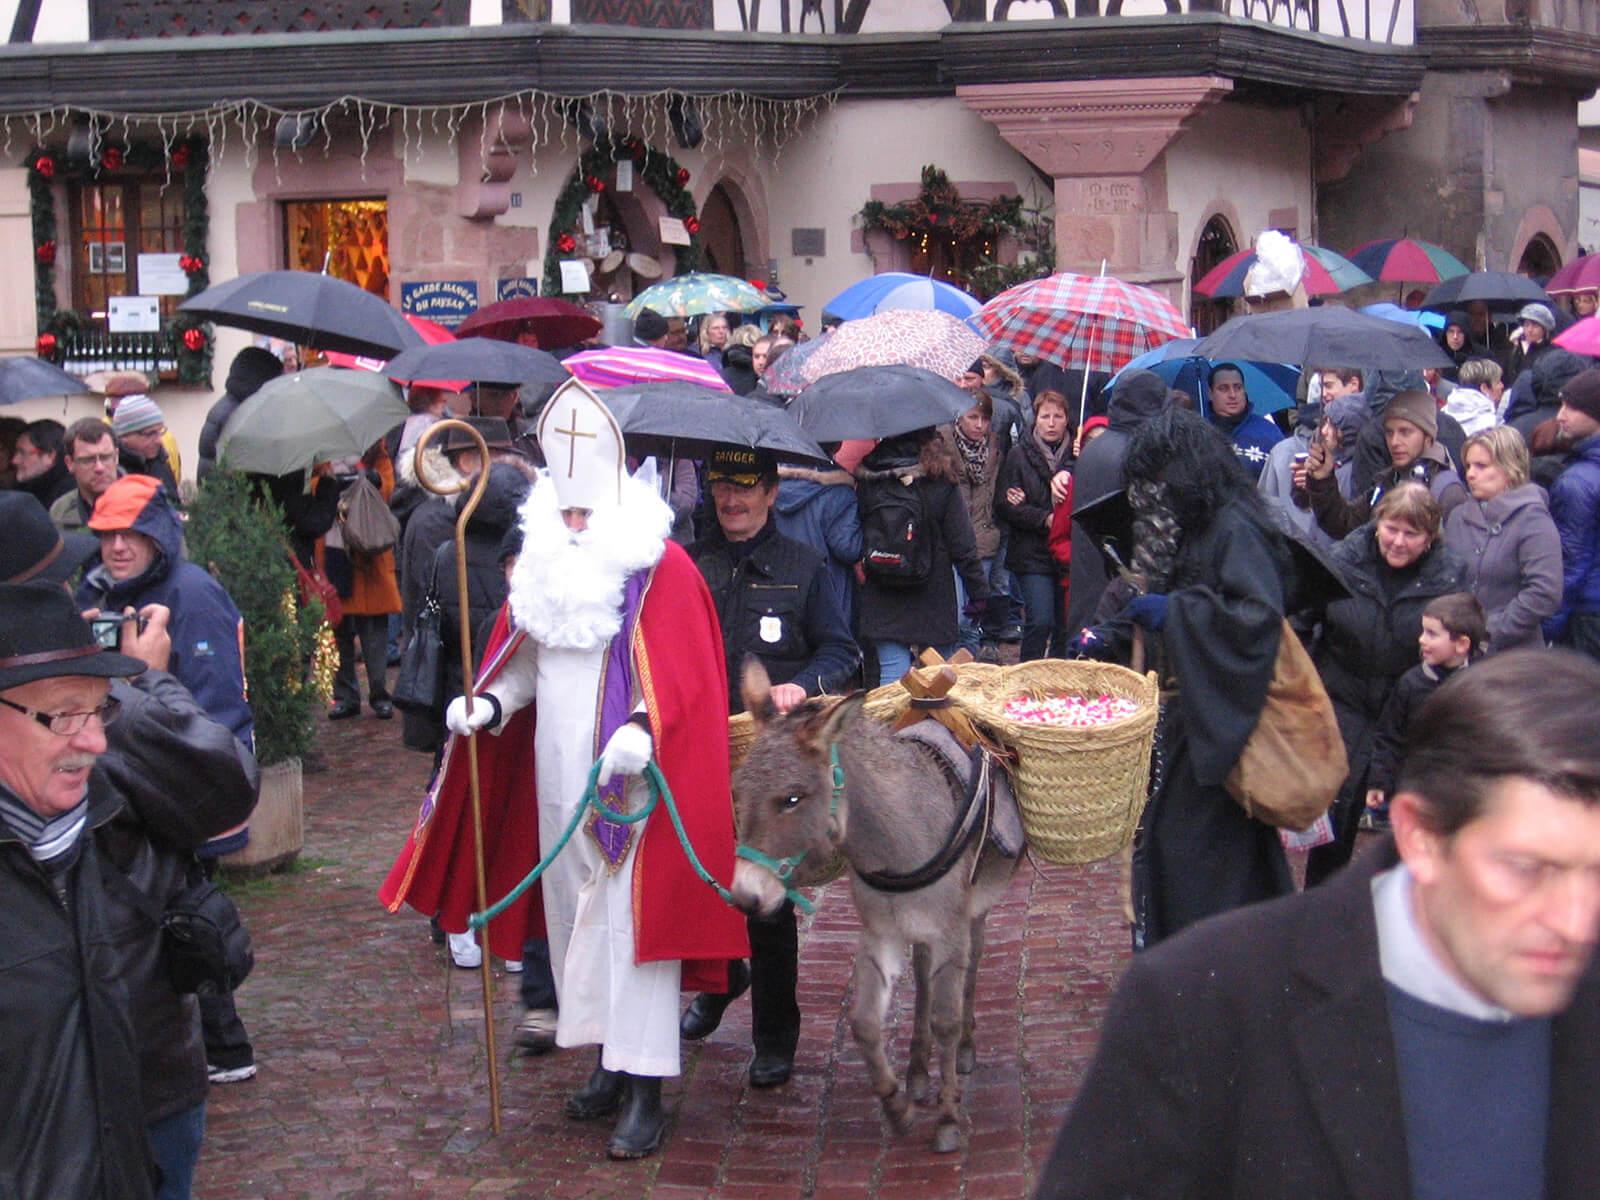 https://apps.tourisme-alsace.info/photos/kaysersberg/photos/saint_Nicolas_et_son_ane.jpg